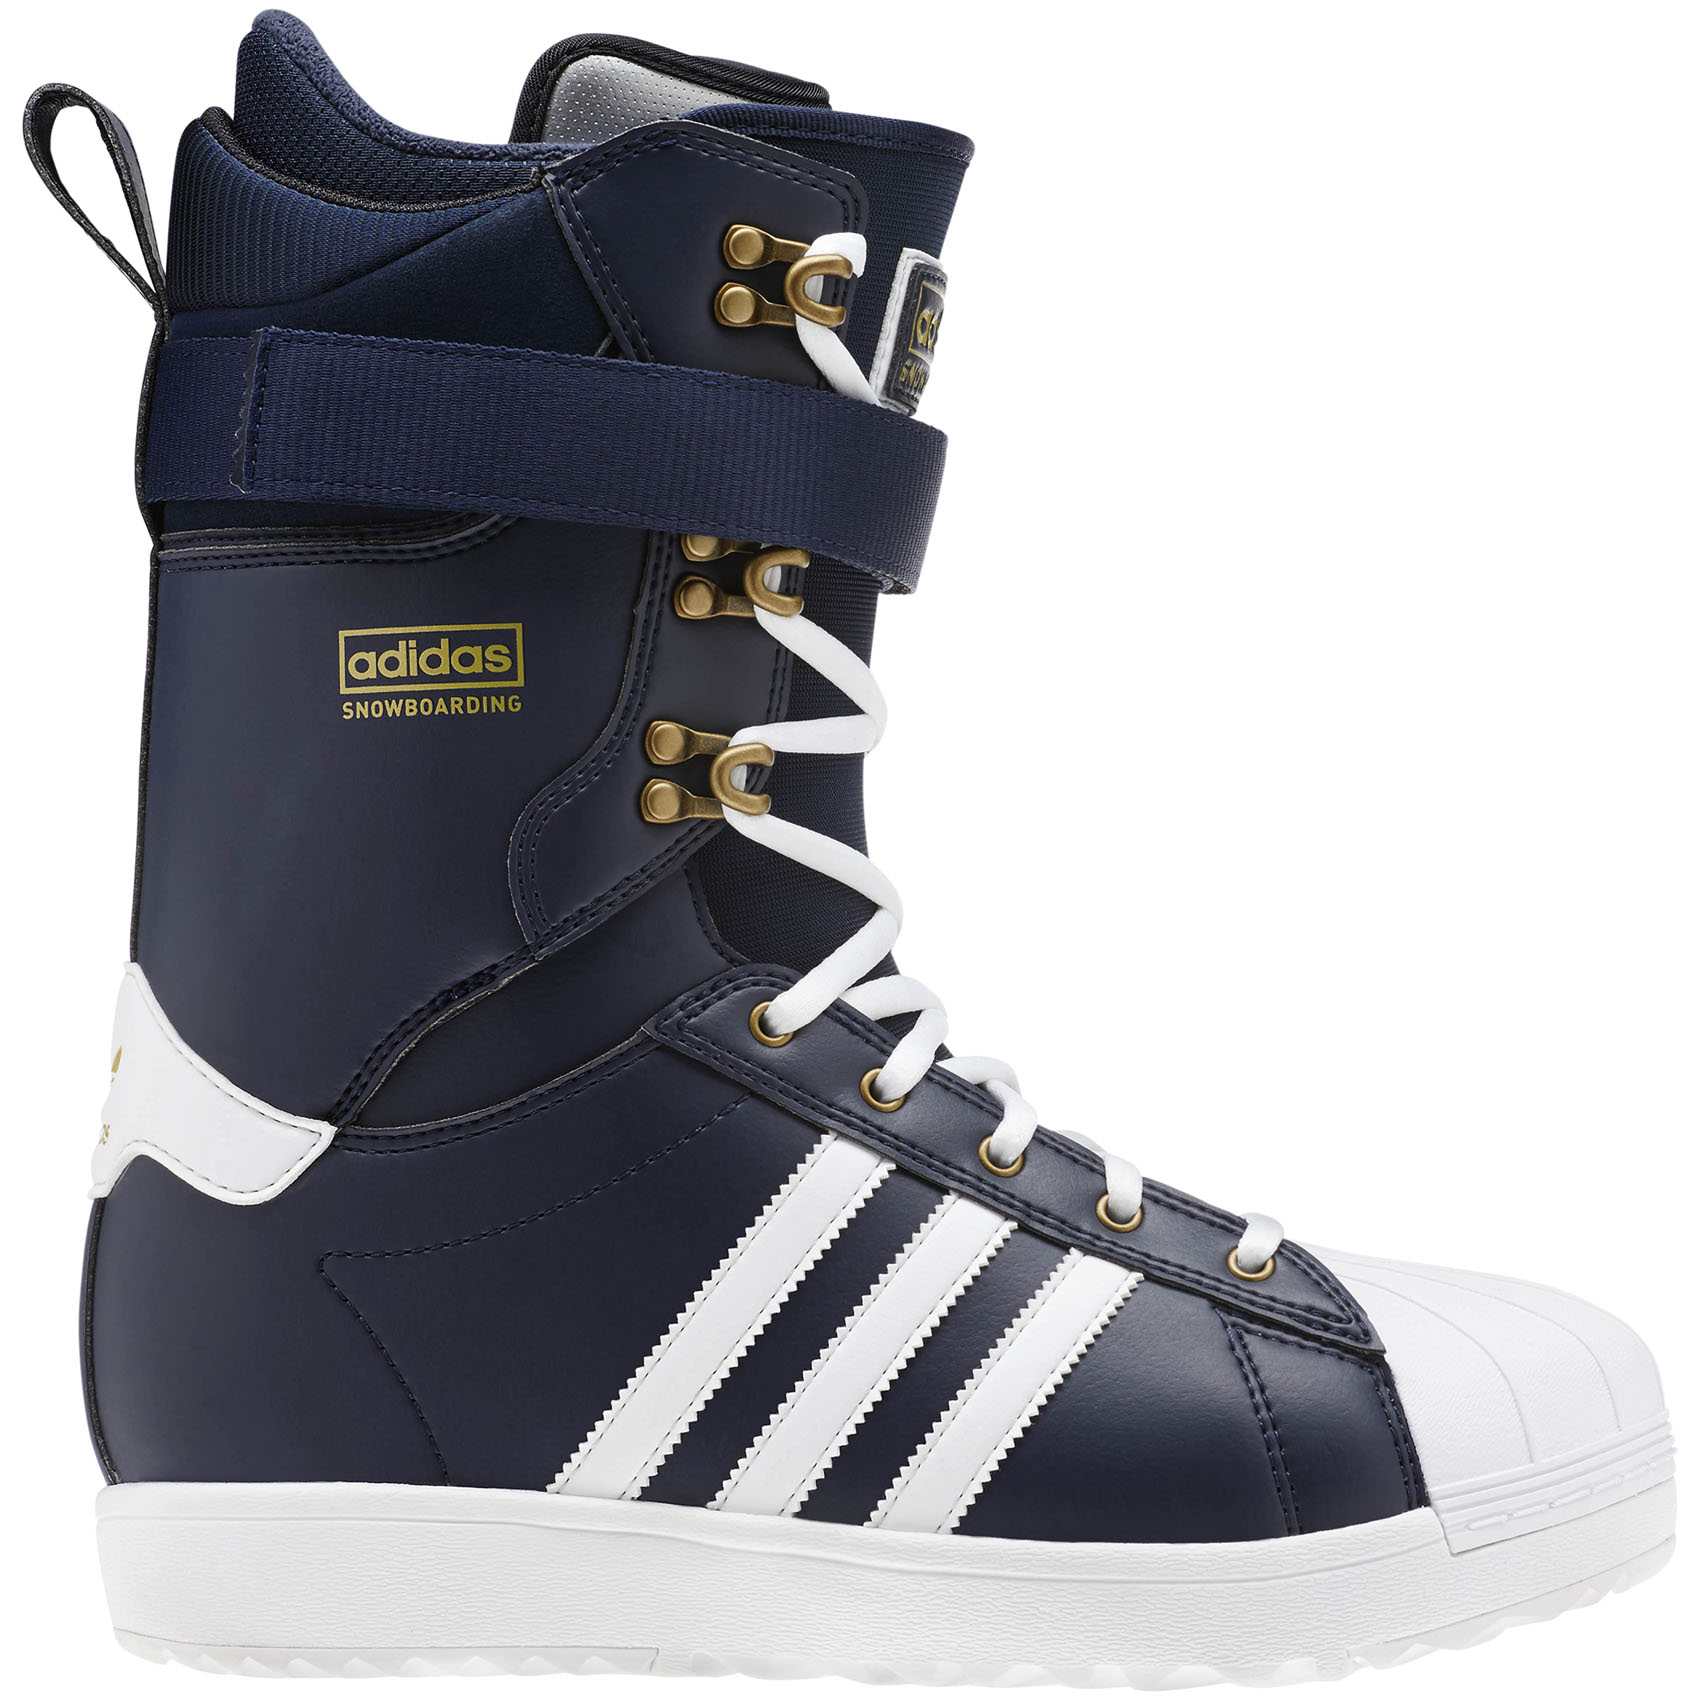 2ca8246b73d3 Adidas Superstar Adv Snowboard Boot 2019